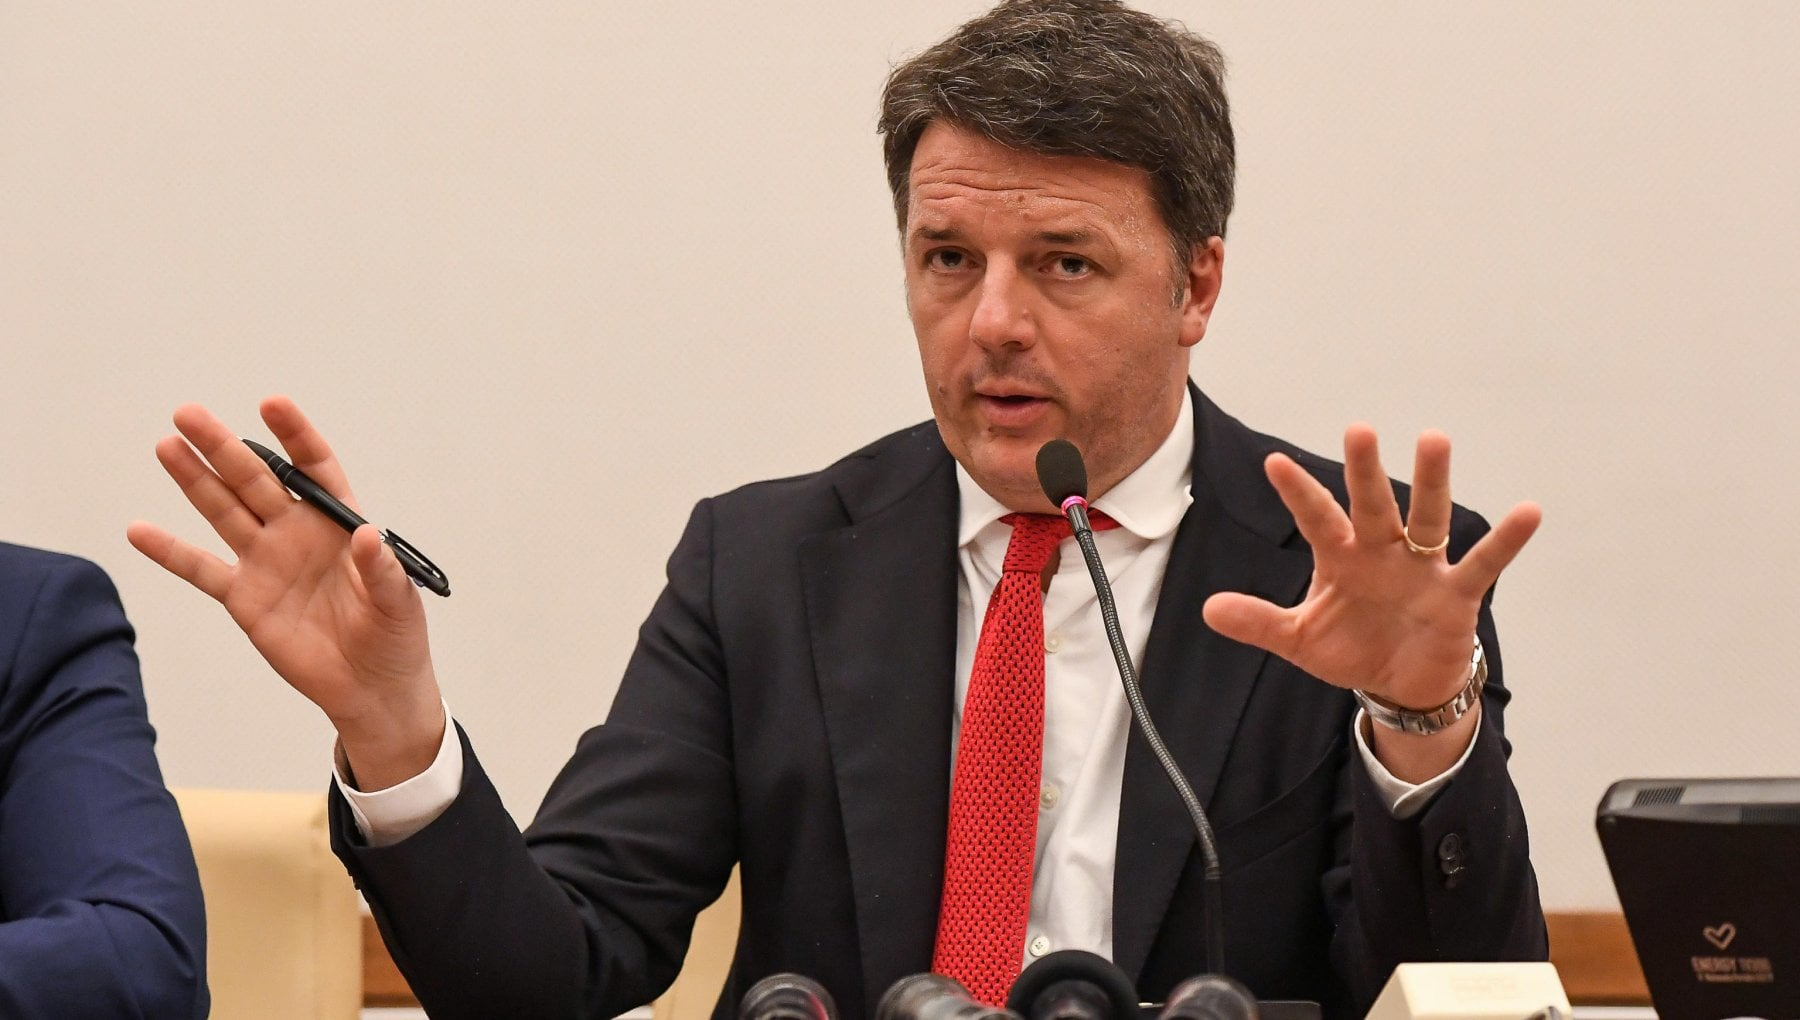 Recovery Renzi I prossimi incontri siano in streaming